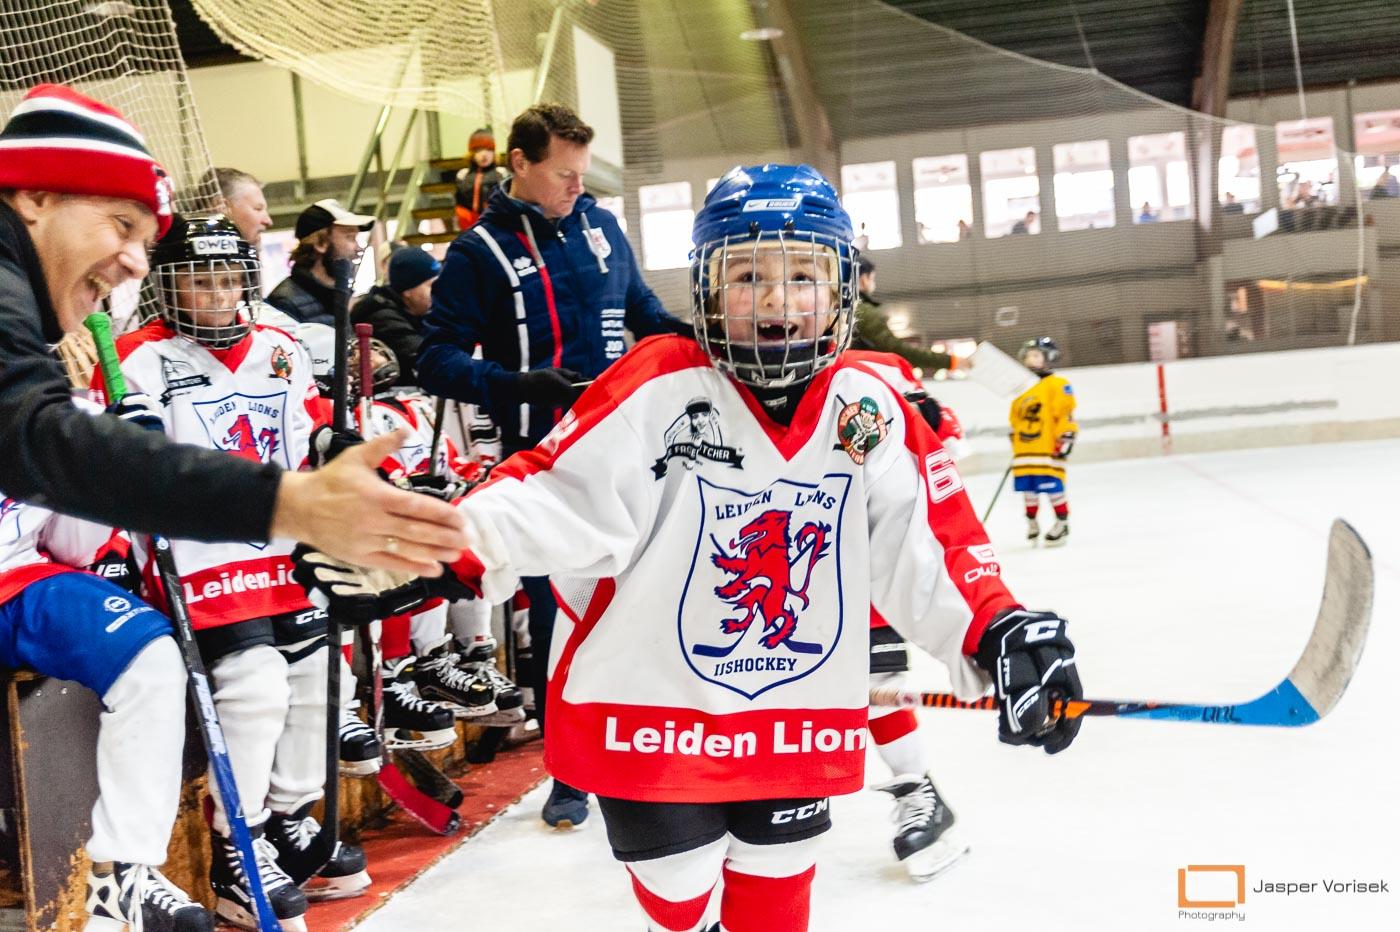 Leiden Lions score a goal